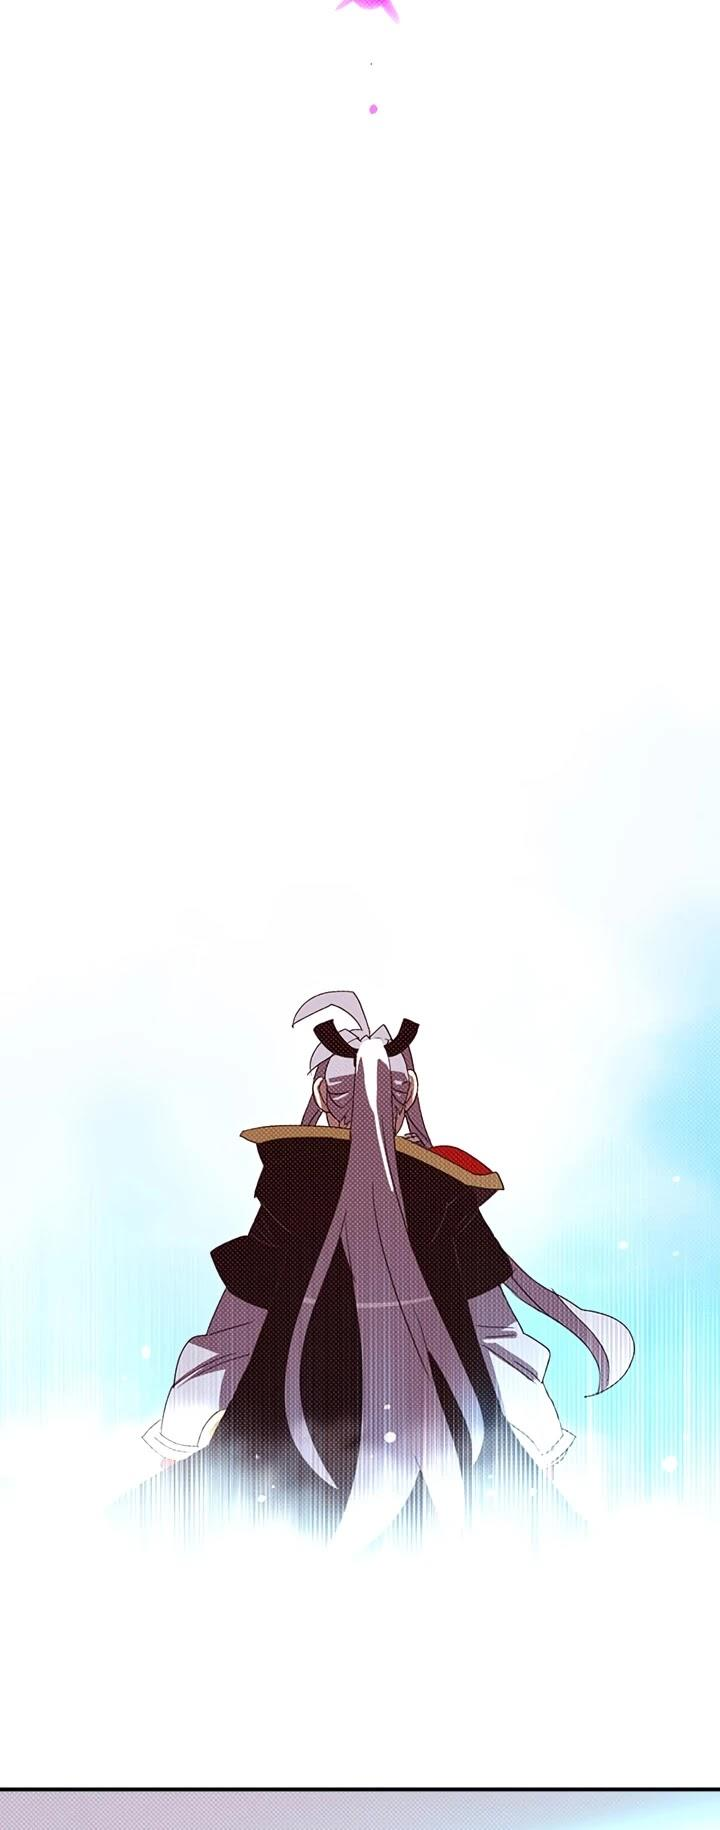 I Am The Sorcerer King Chapter 143 page 24 - Mangakakalot